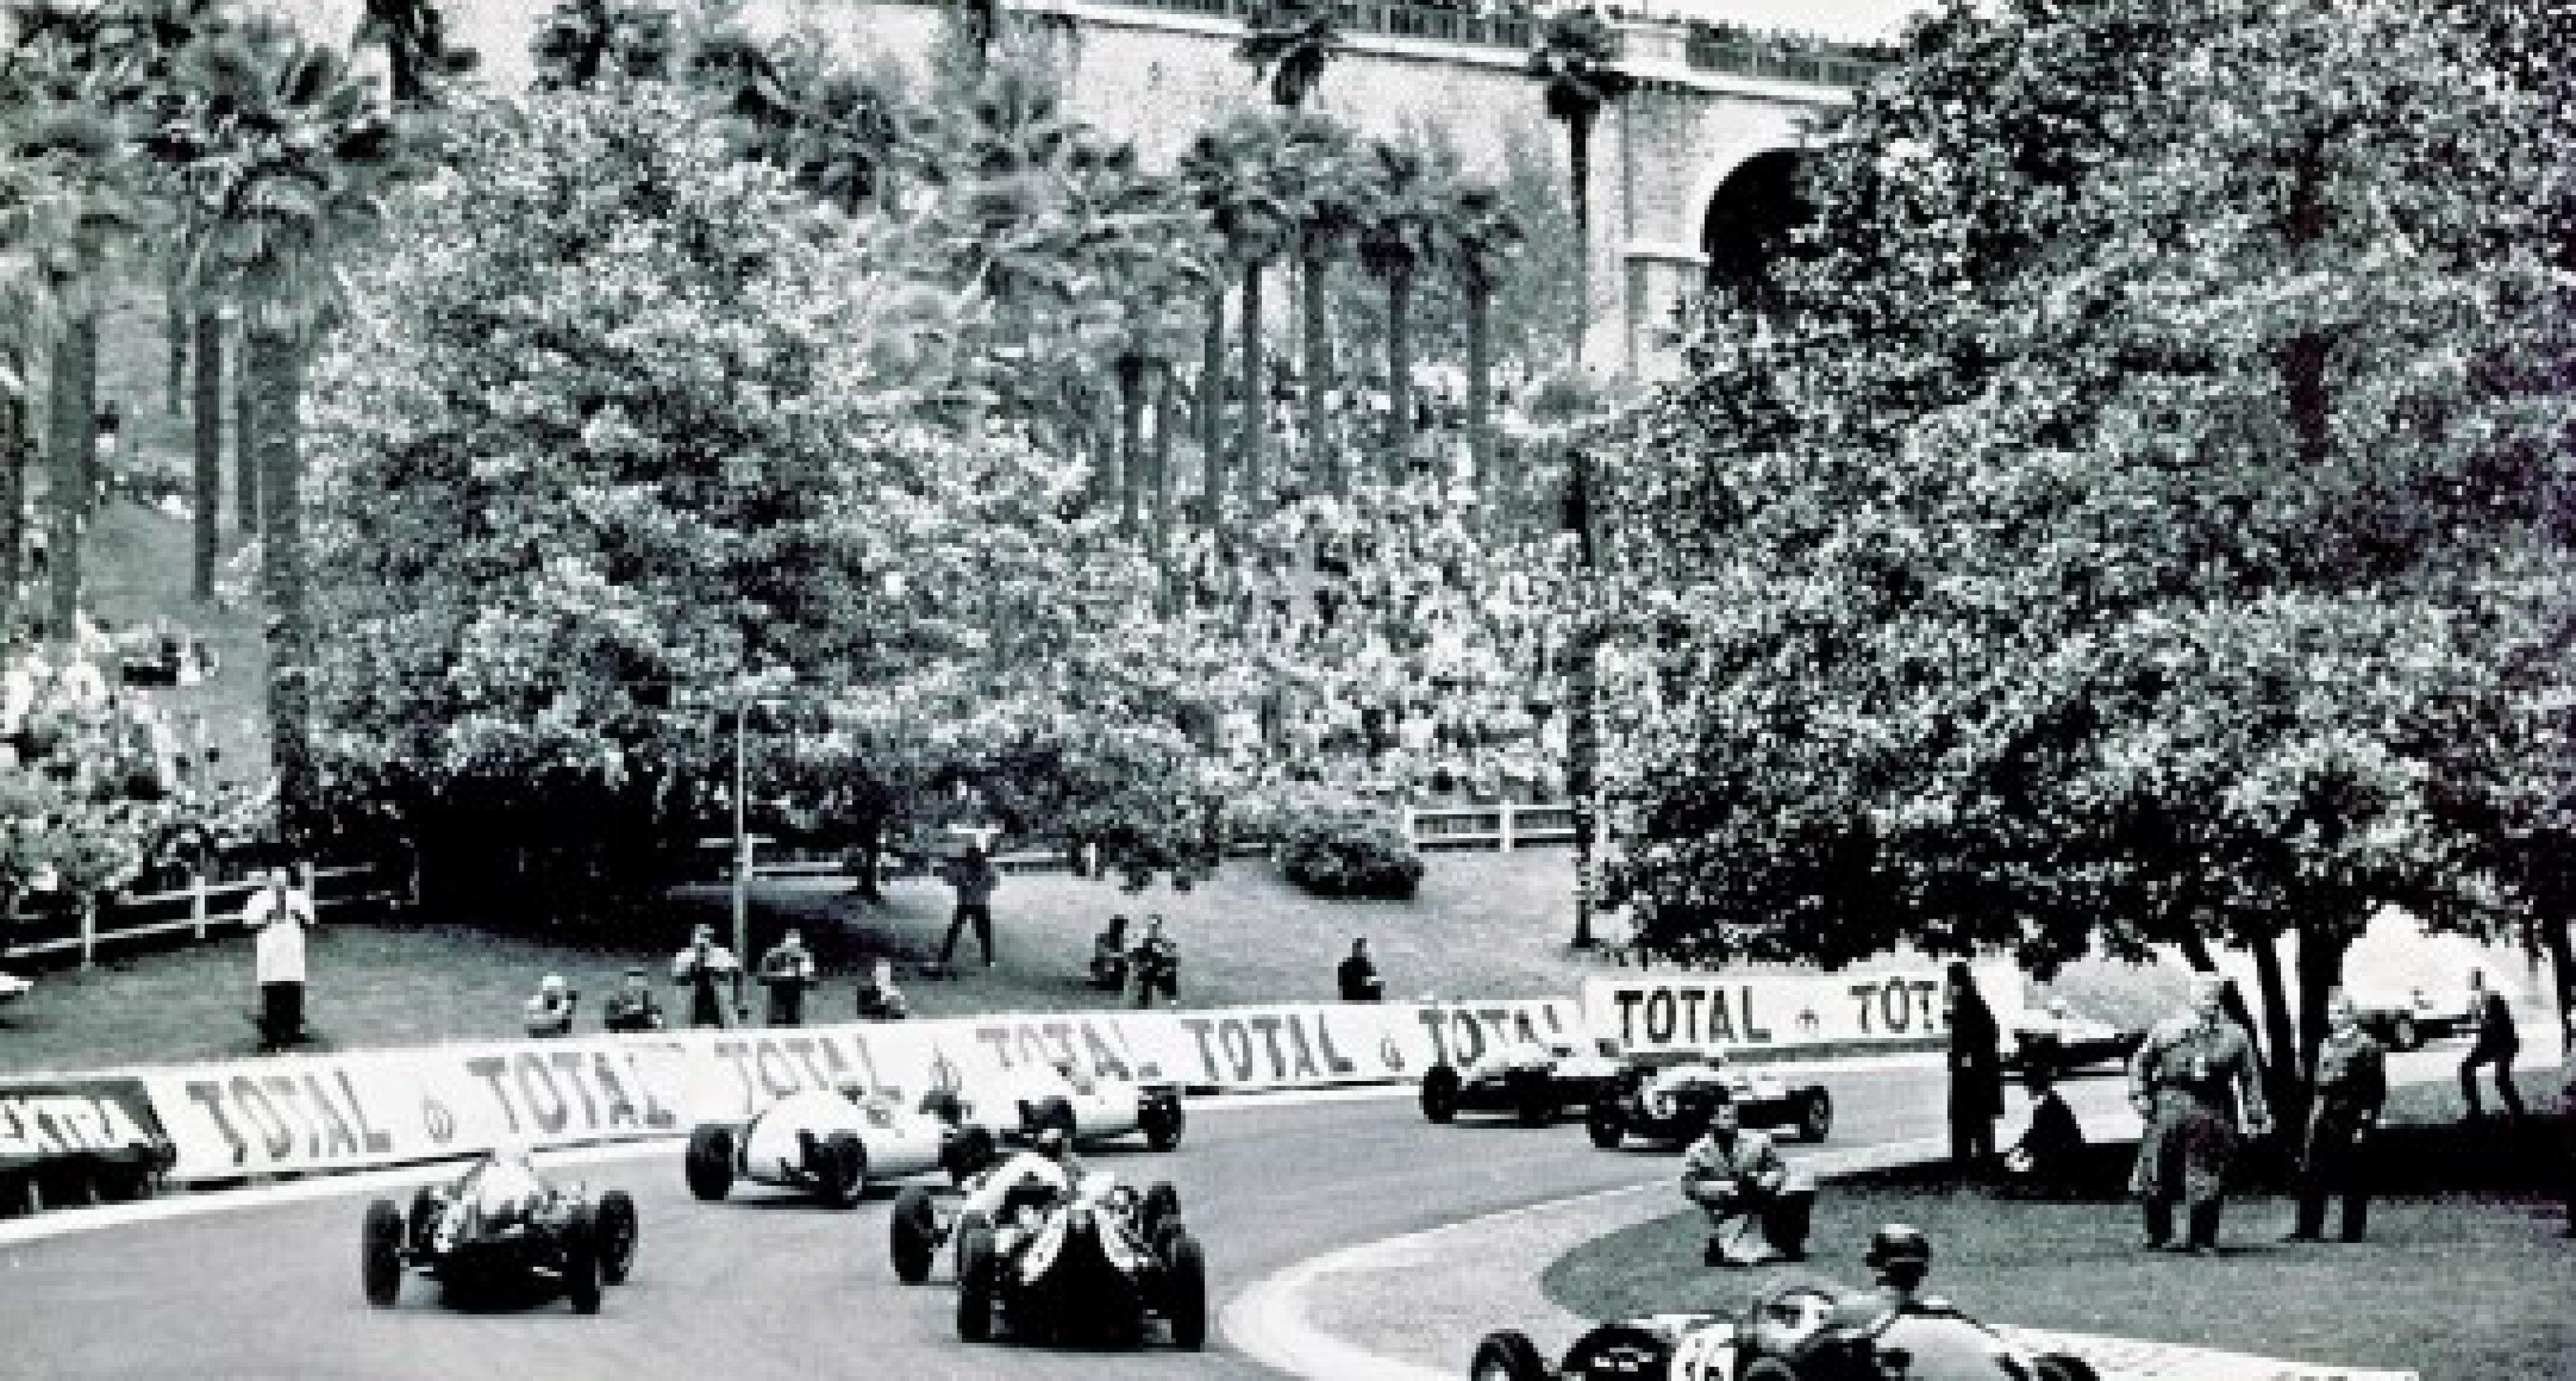 Grand Prix de Pau Historique 2009: Erfrischung in den Pyrenäen